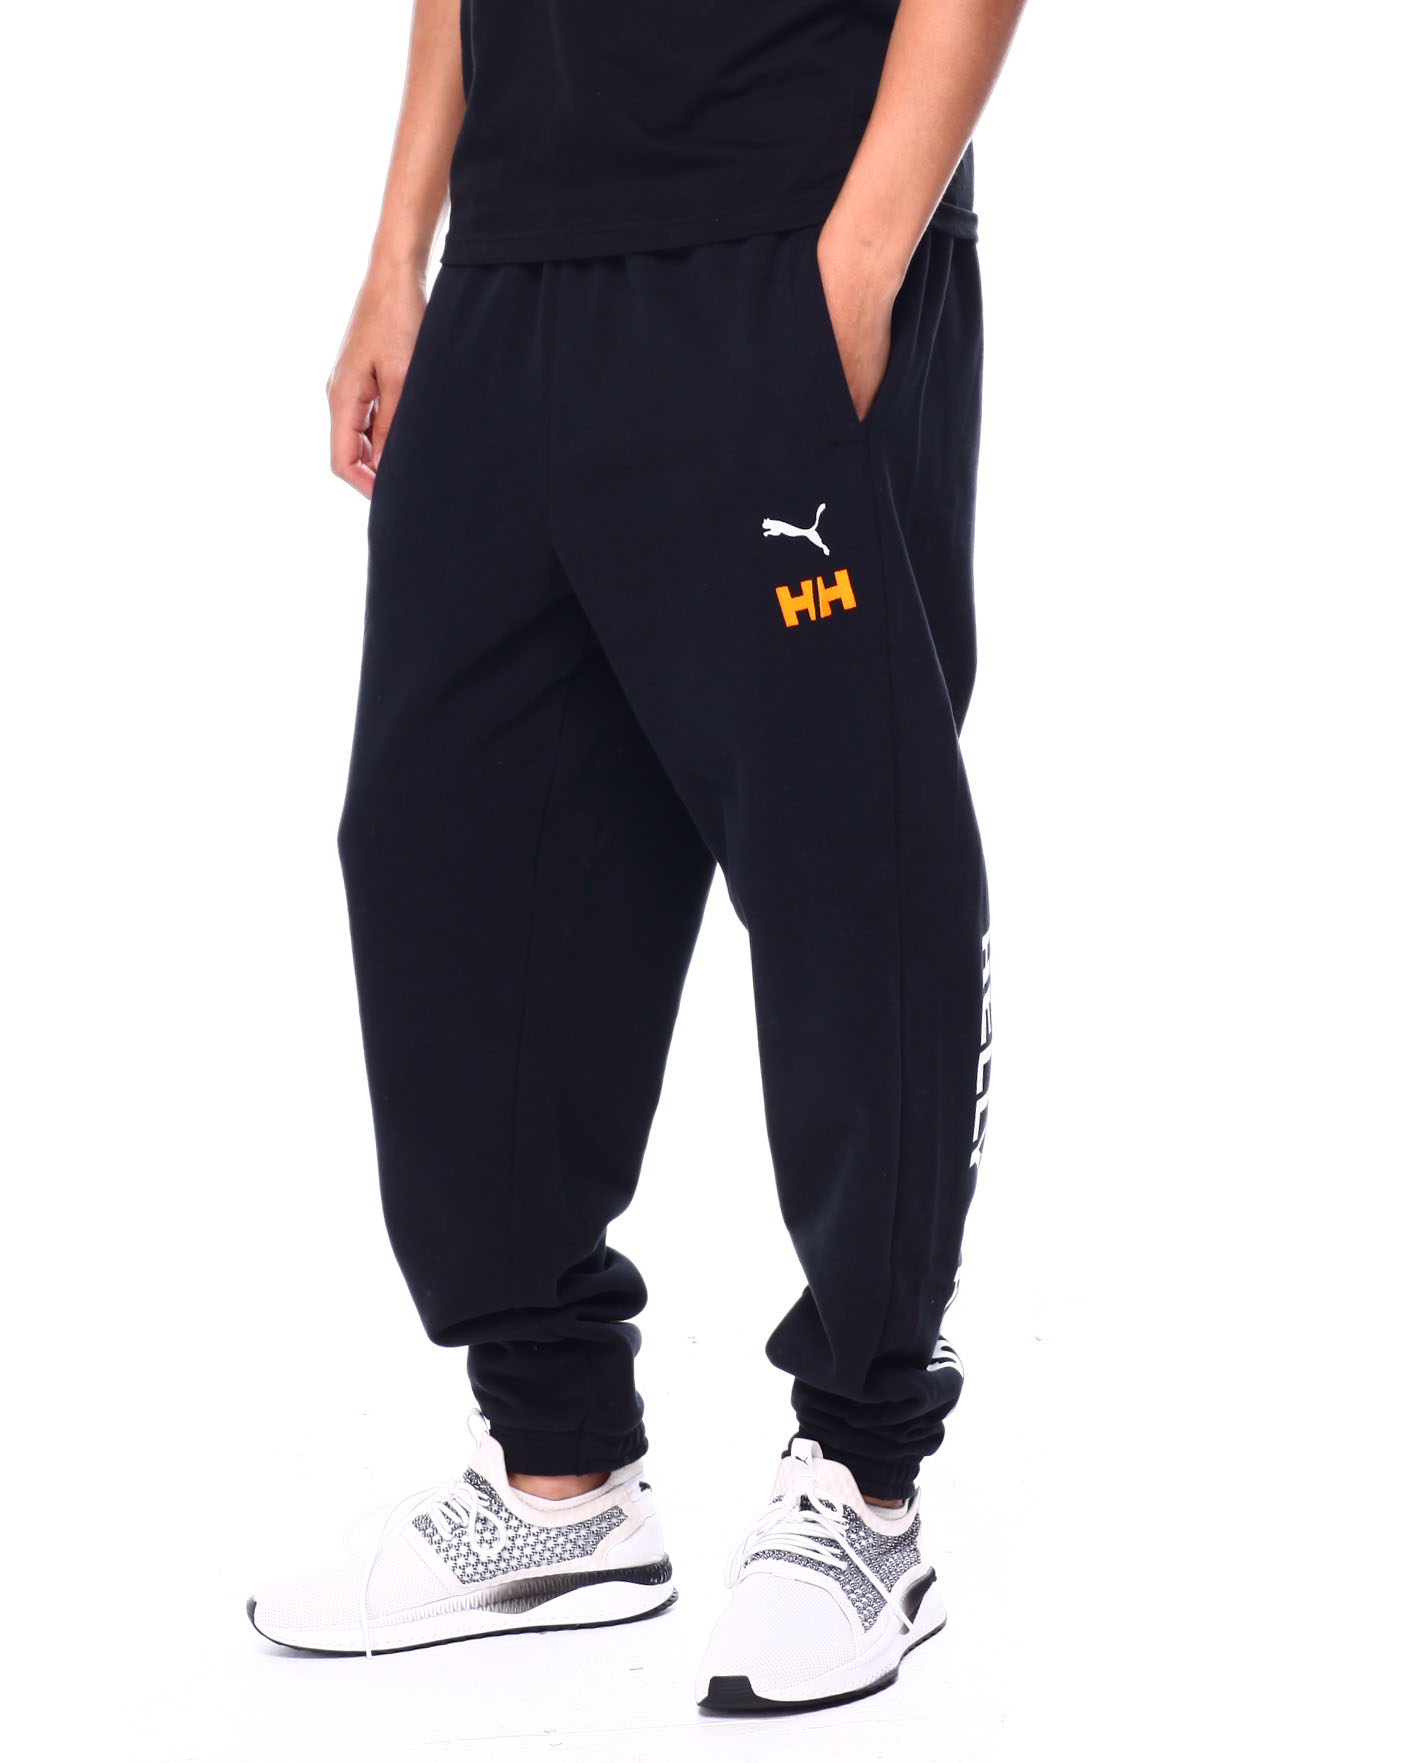 Buy PUMA X HH FLEECE PANTS Men's Jeans & Pants from Puma